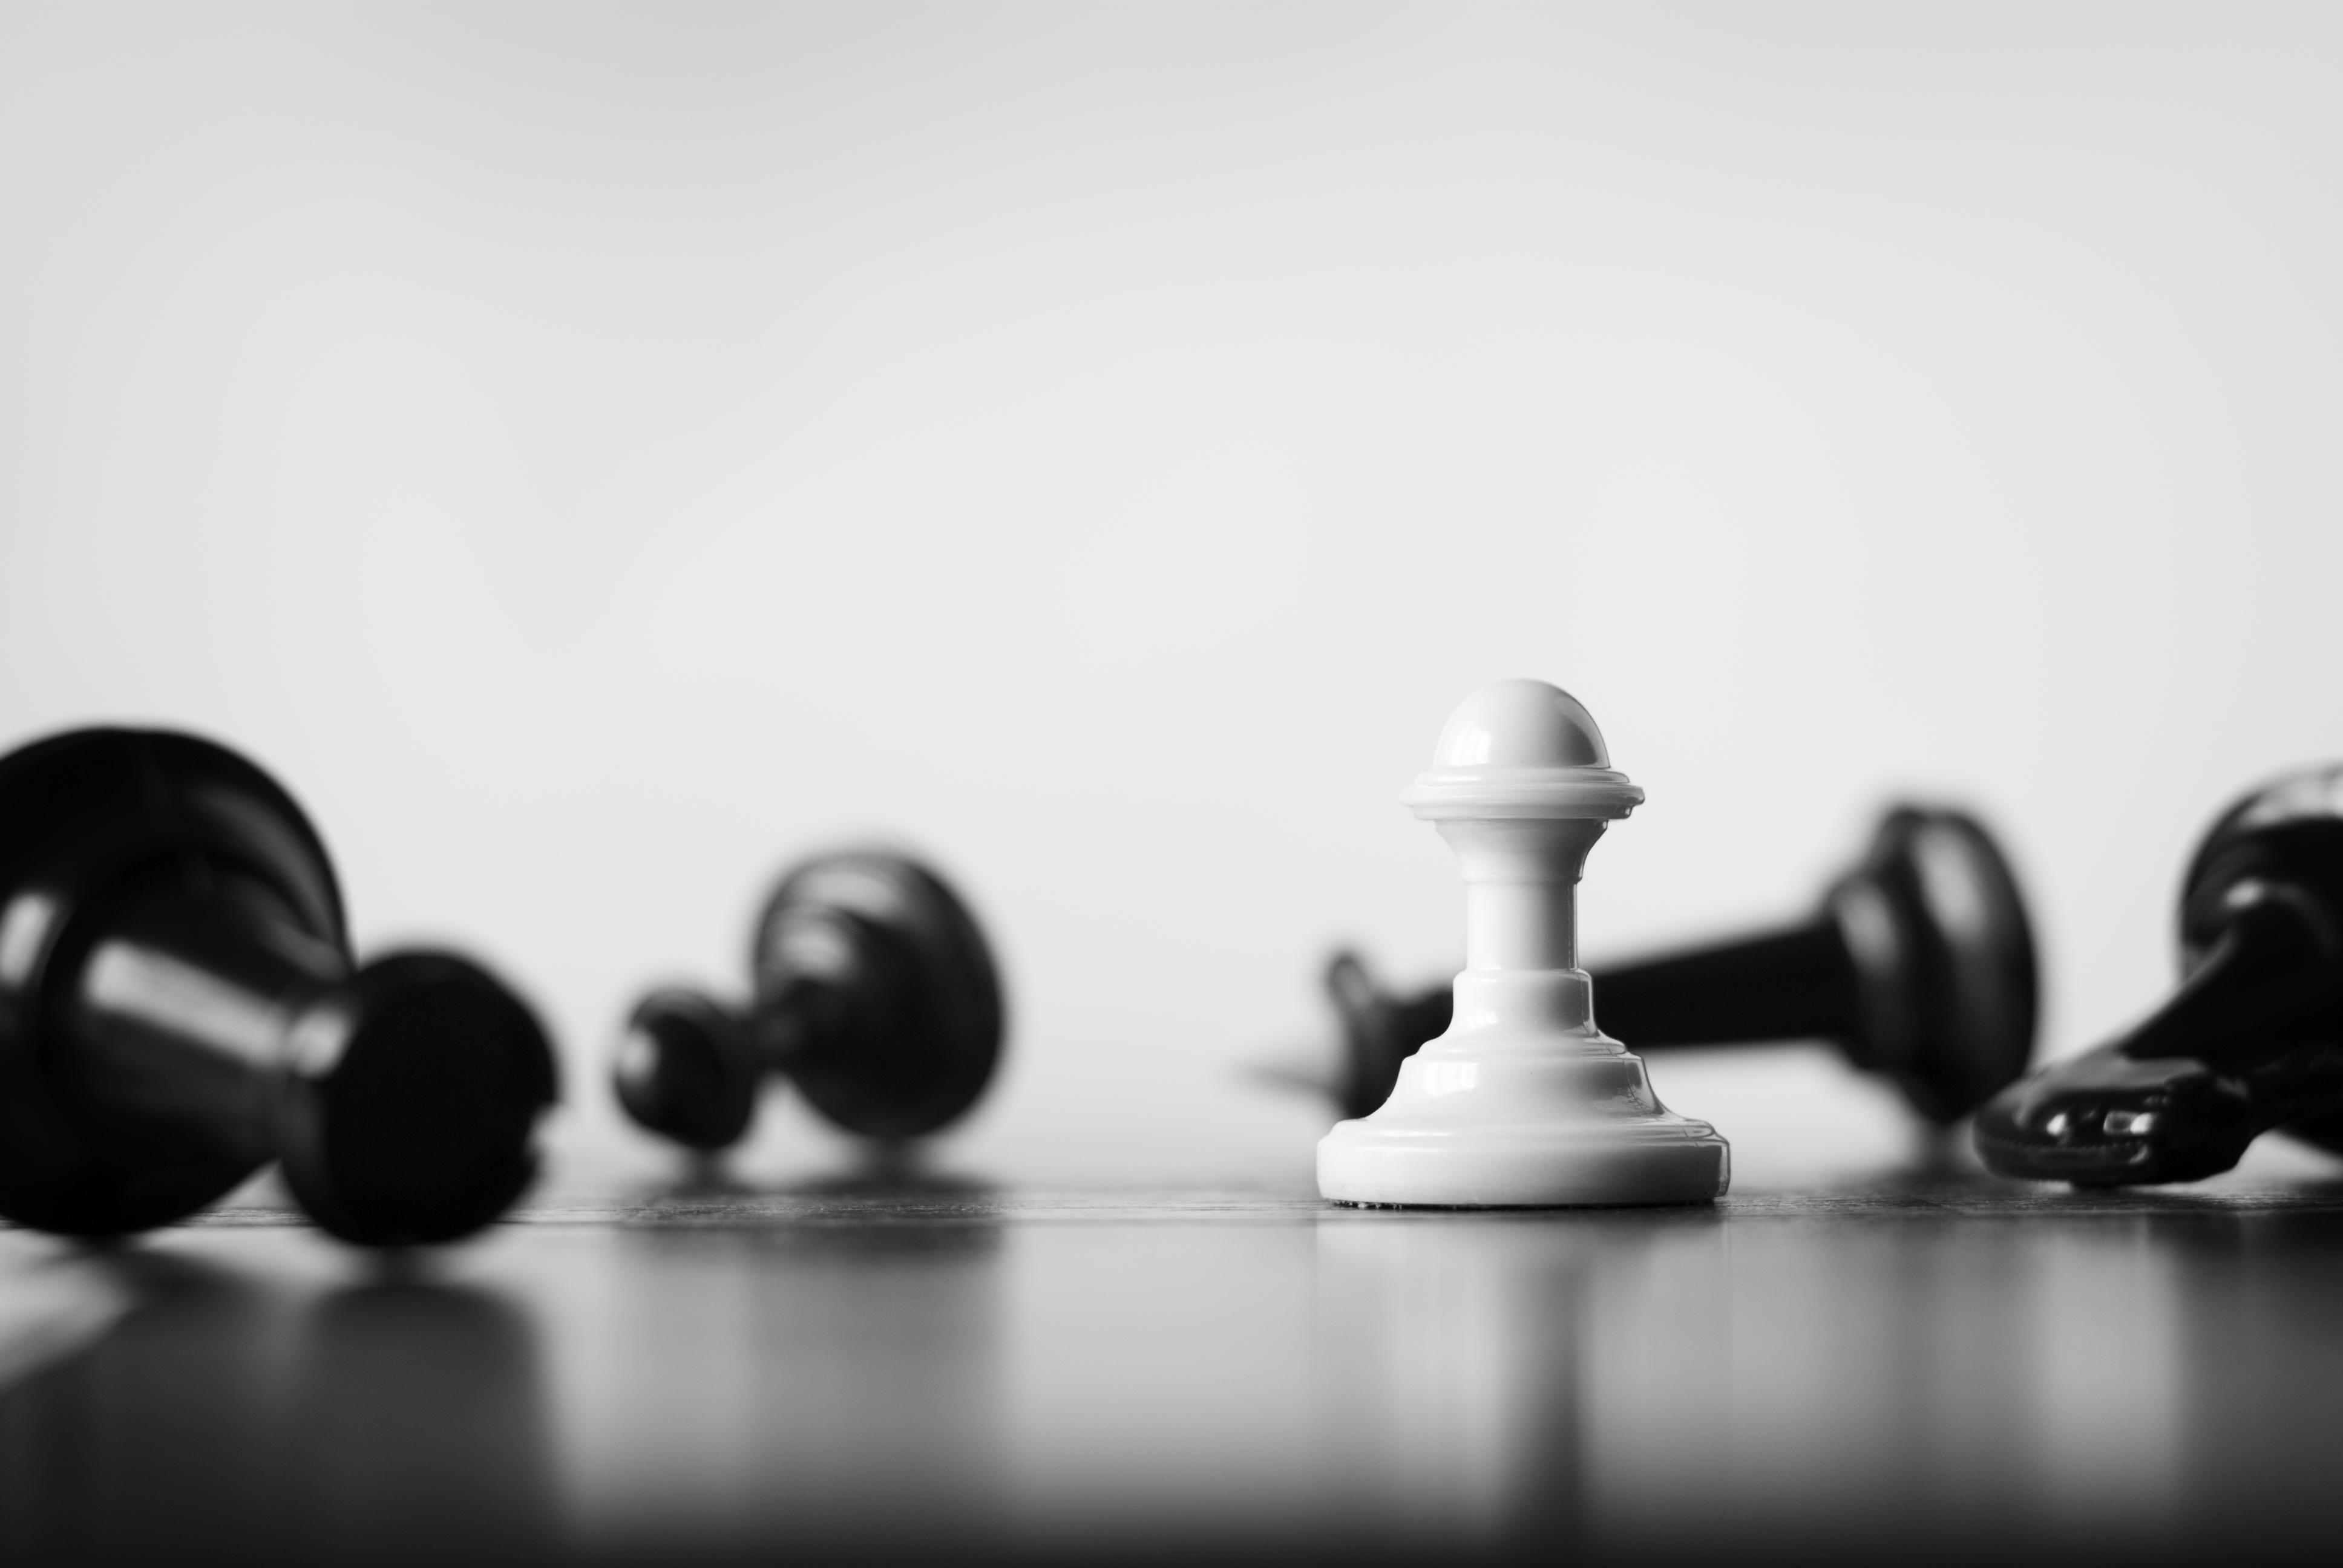 Single white pawn on a chess board surro